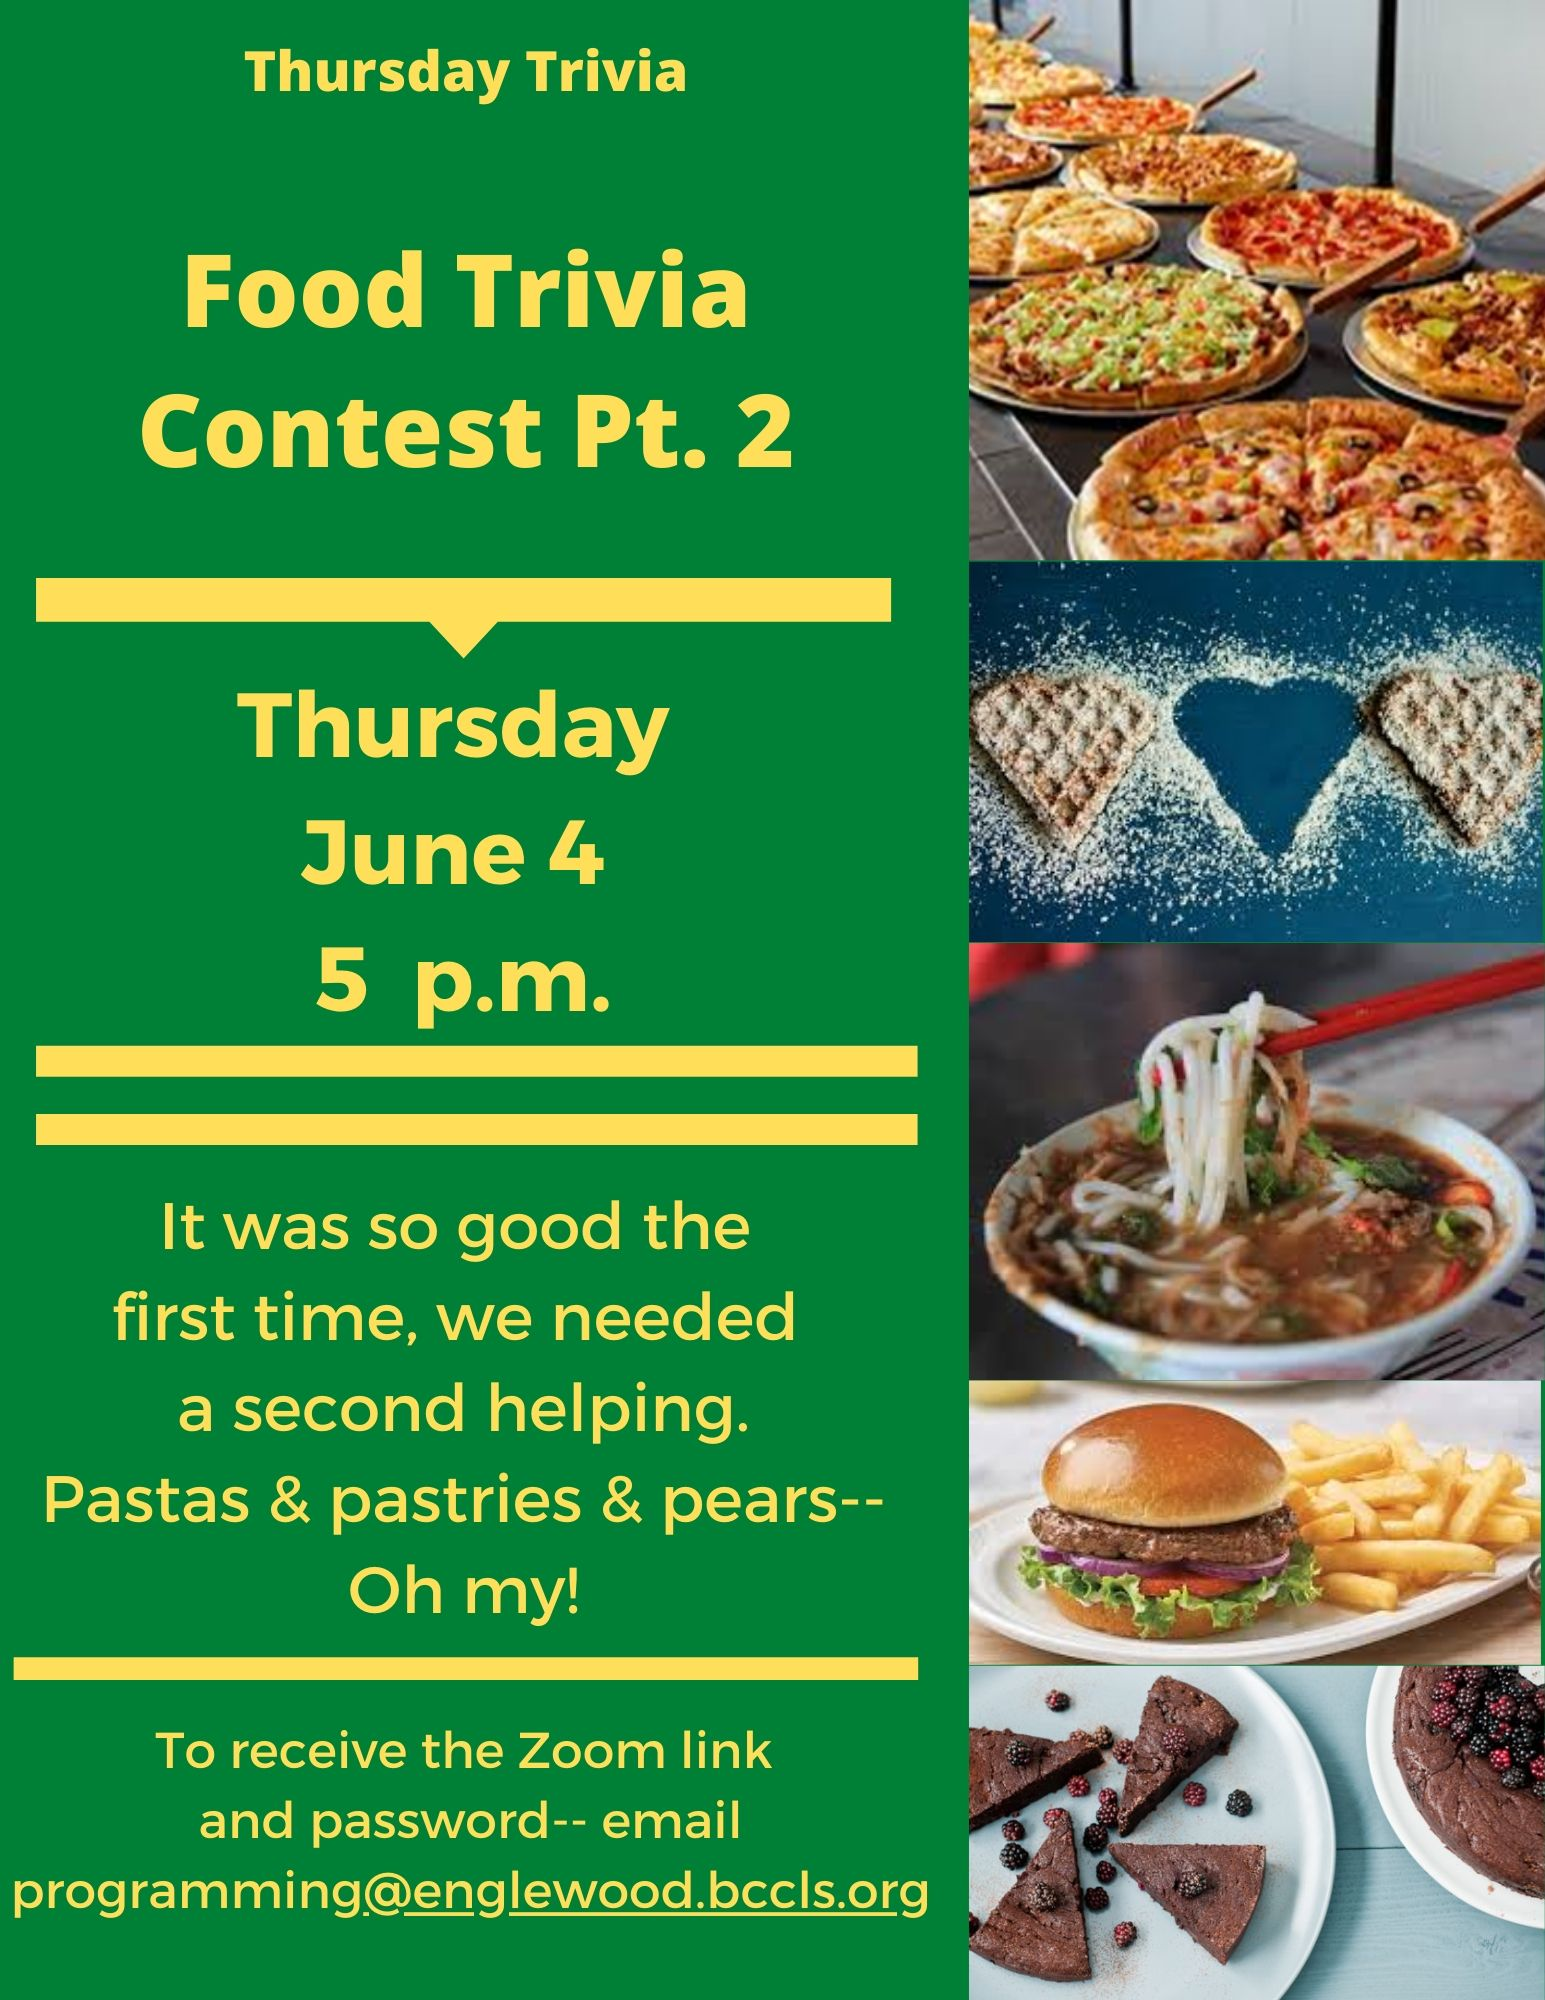 Thursday Trivia via Zoom: Food Pt. 2